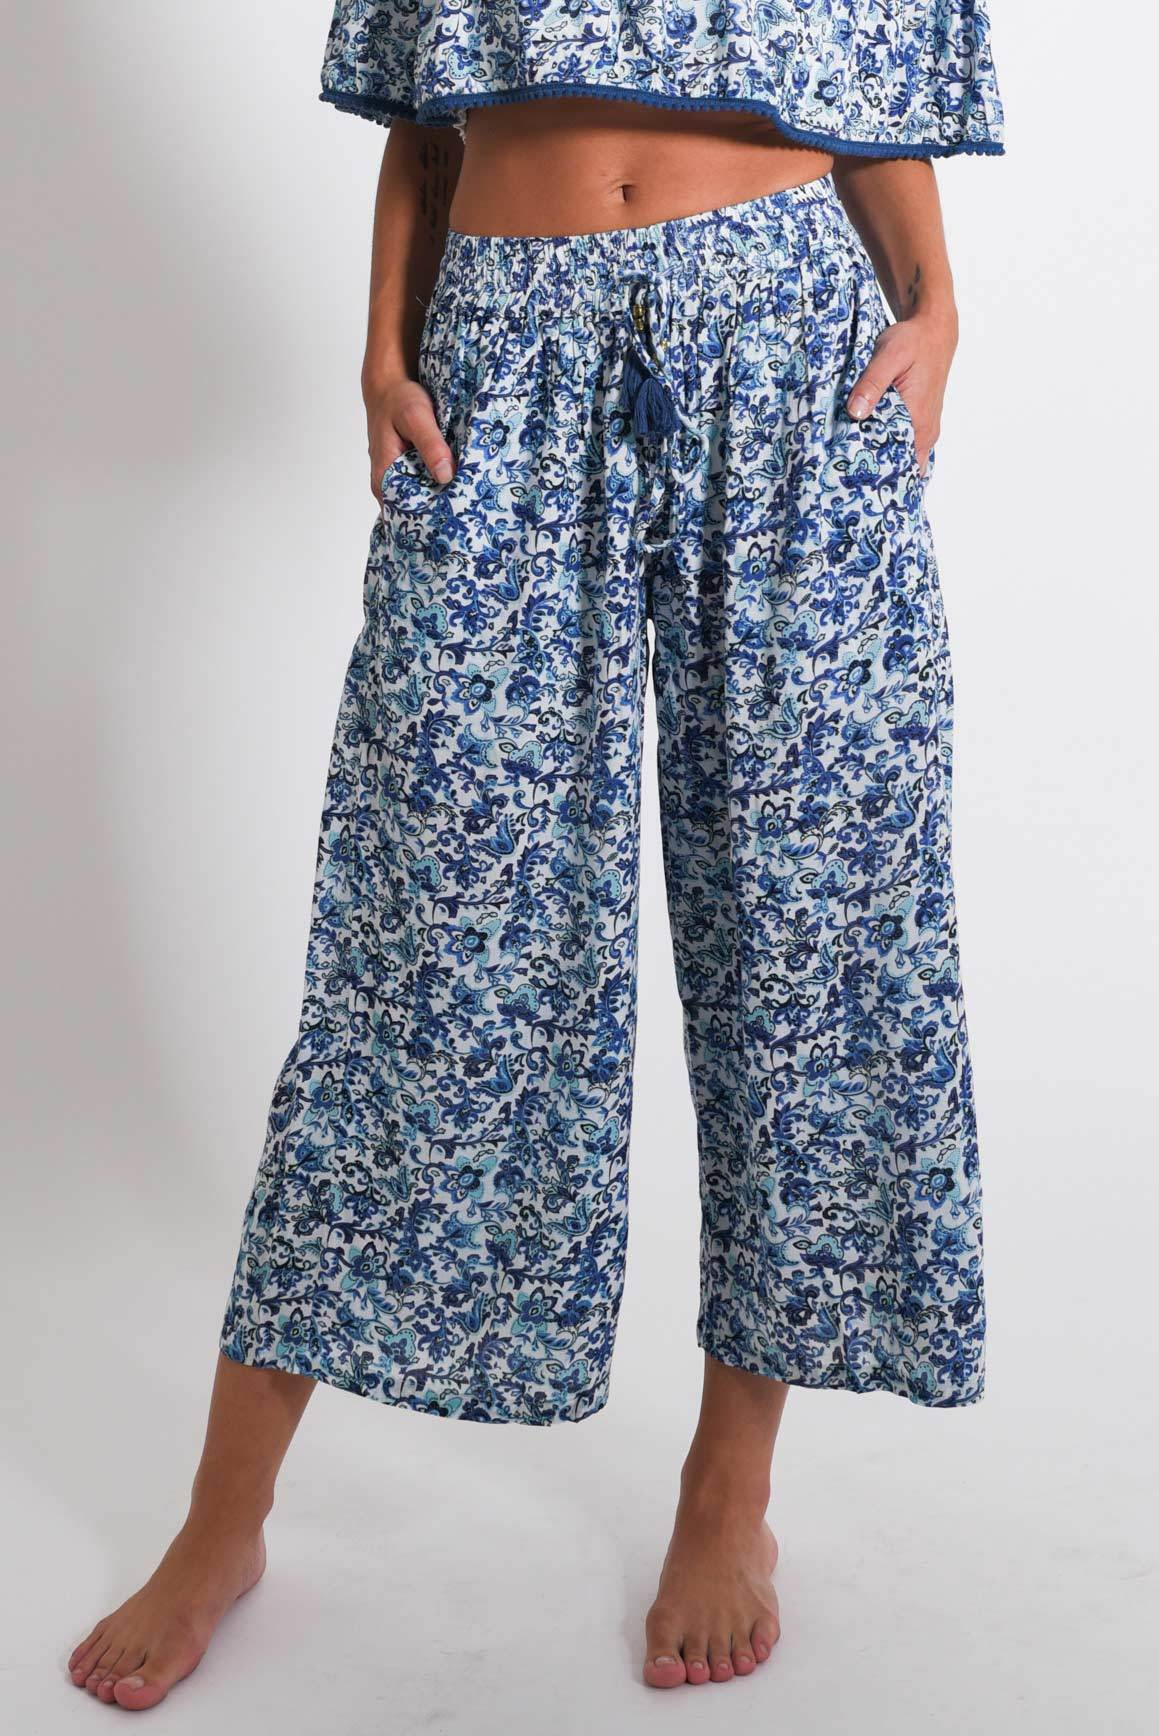 Aanya_Bohemian_Women_s_Blue_Tulips_Floral_Midi_Pants-_2-of-5